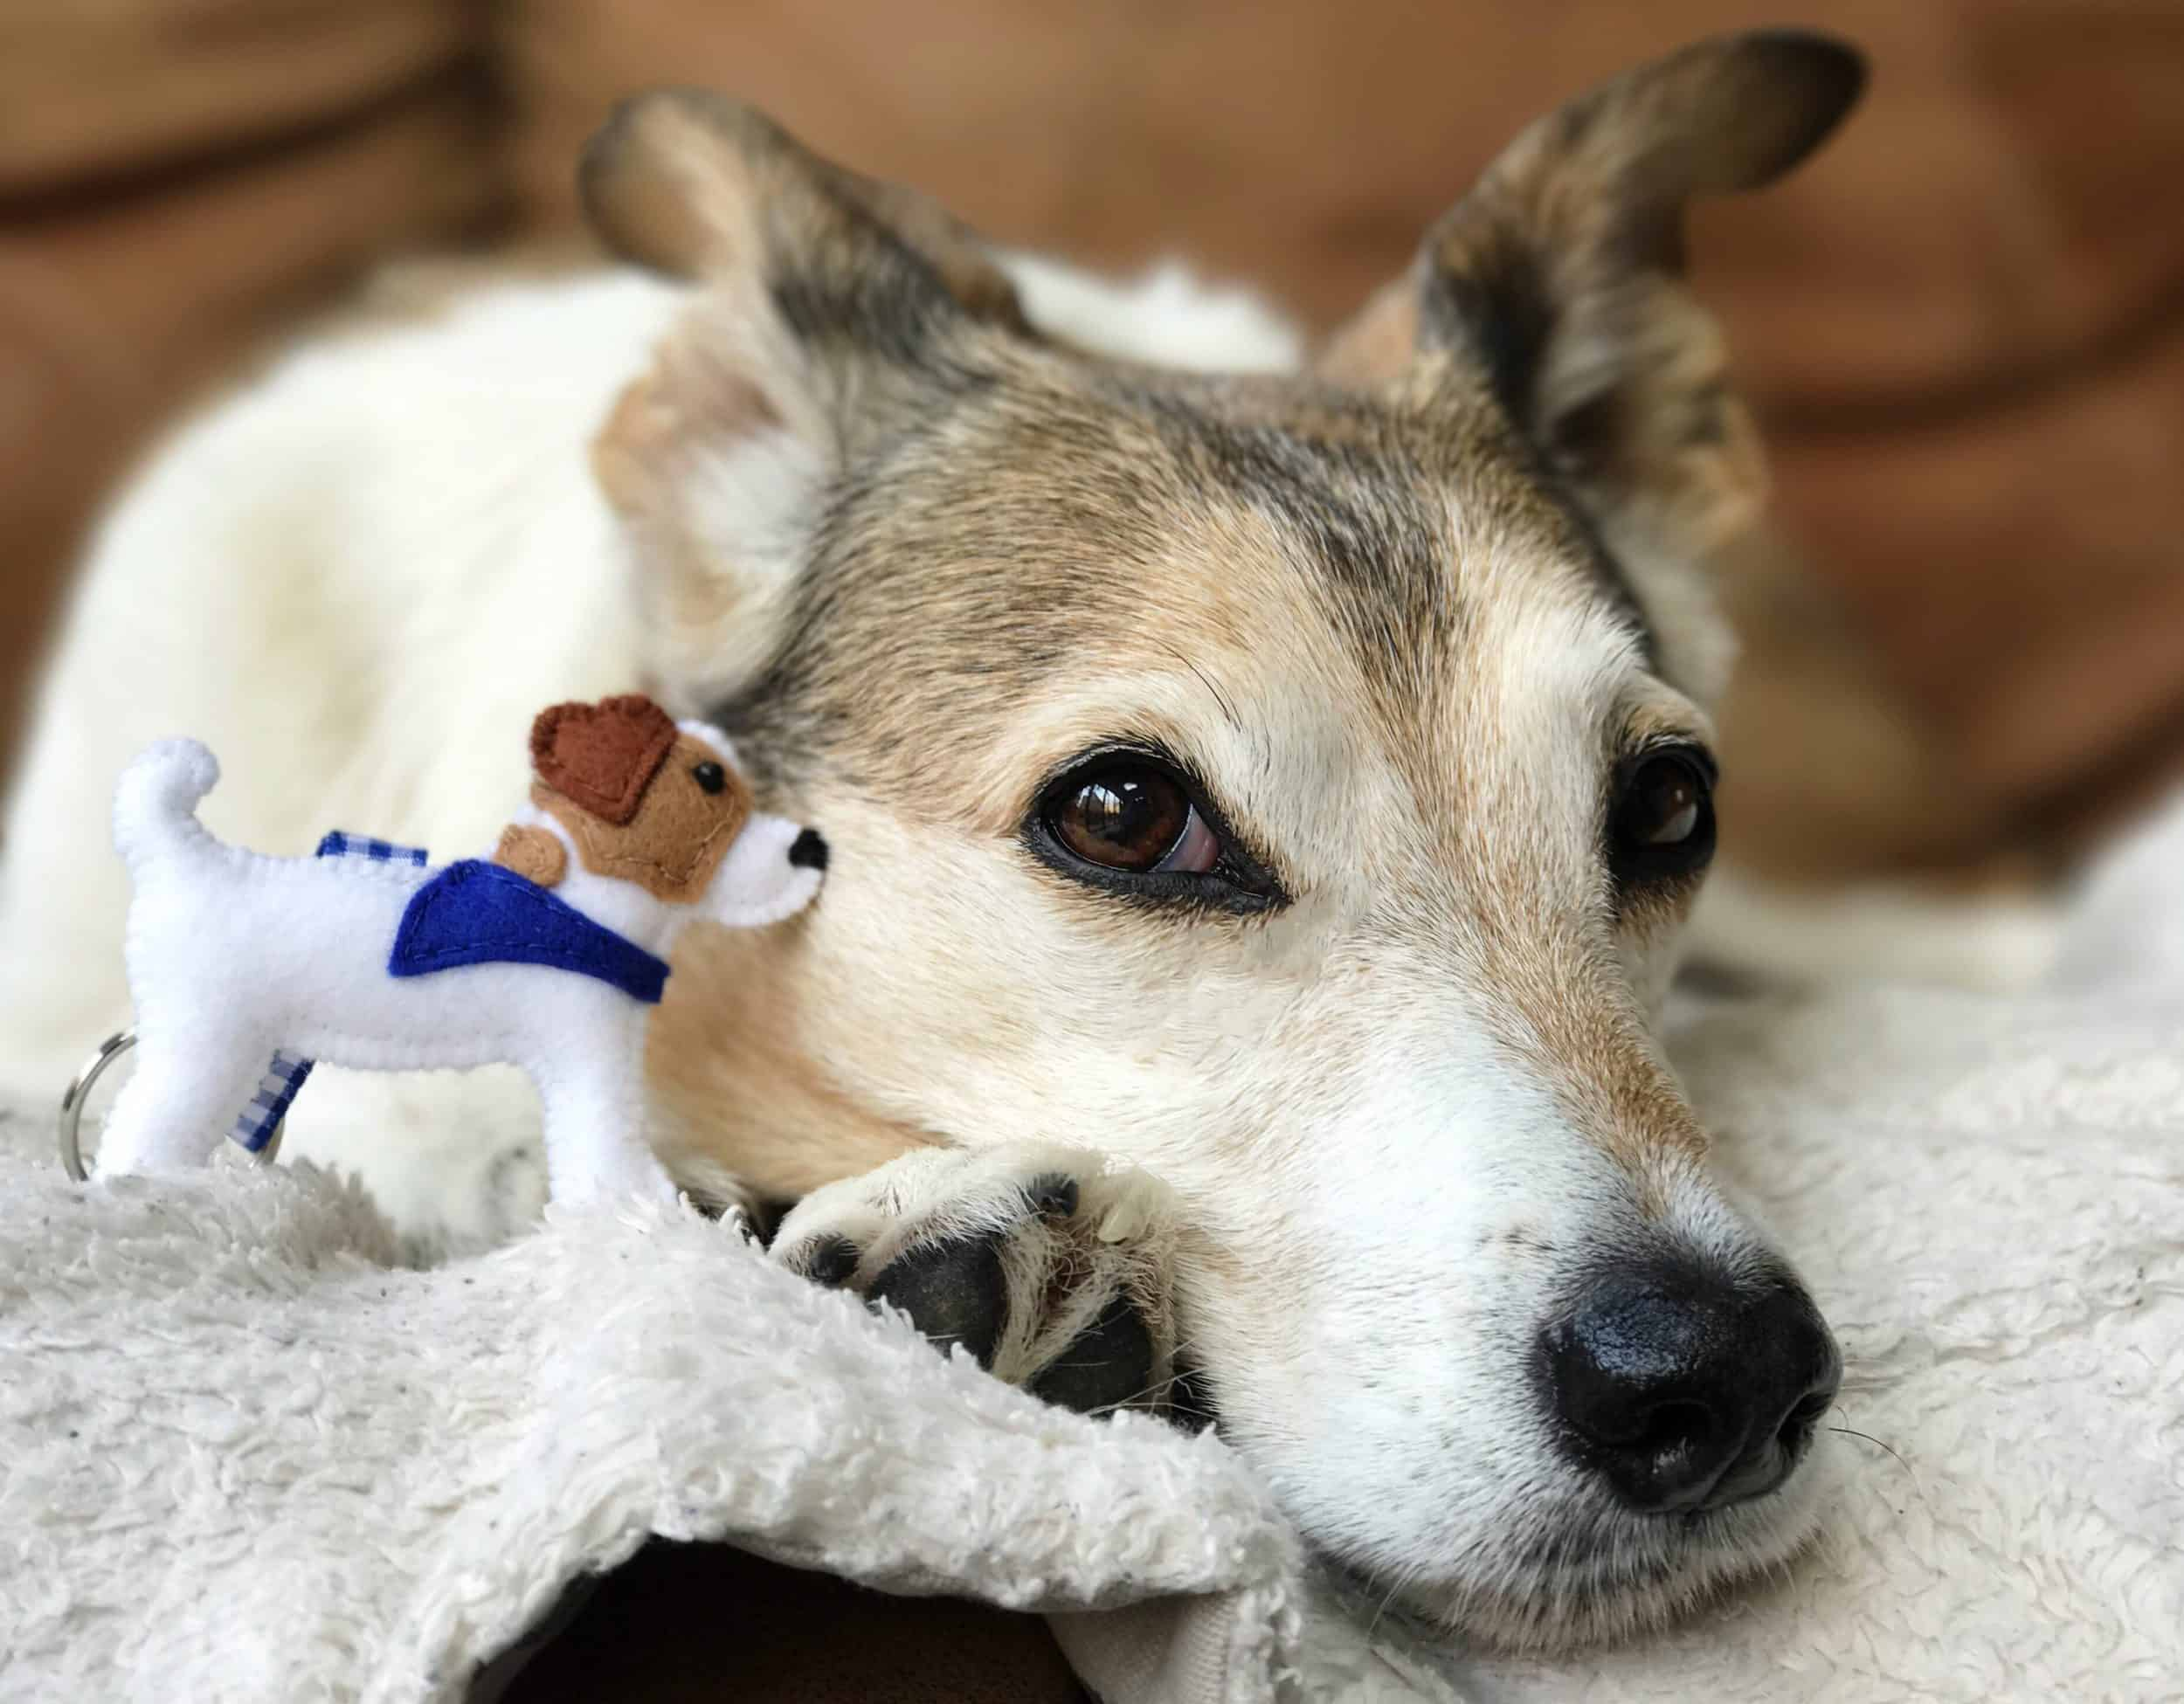 Misheleneous Handmade Dog Gifts